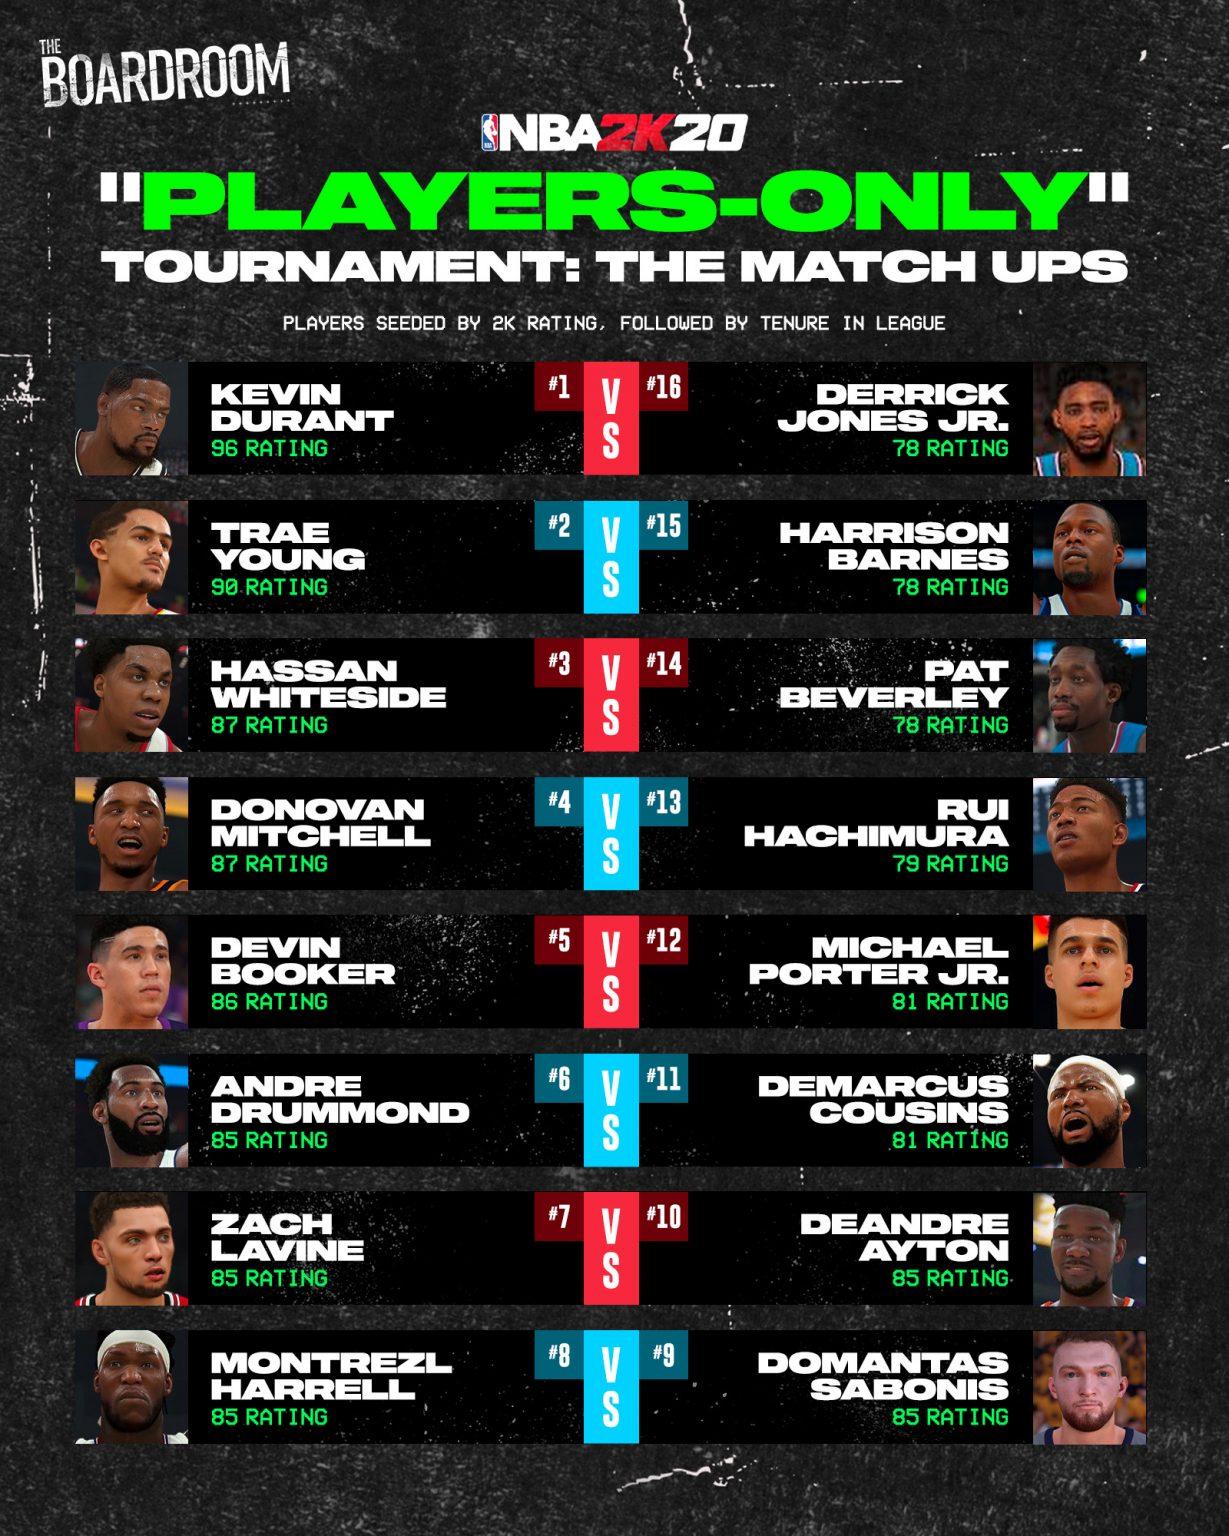 NBA 2K20 Tourney